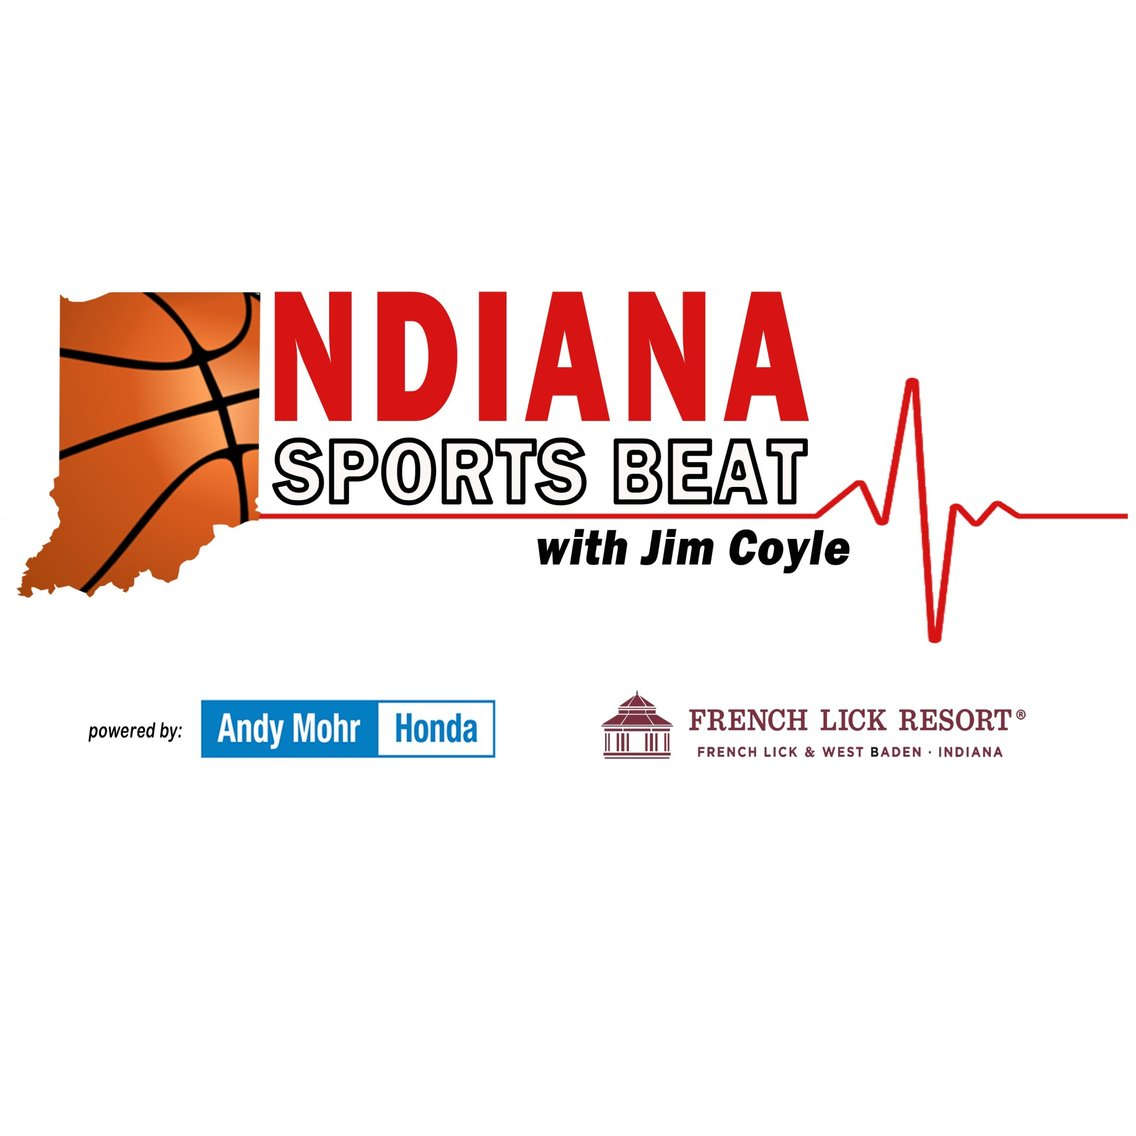 Indiana Sports Beat with Jim Coyle - imagen de portada